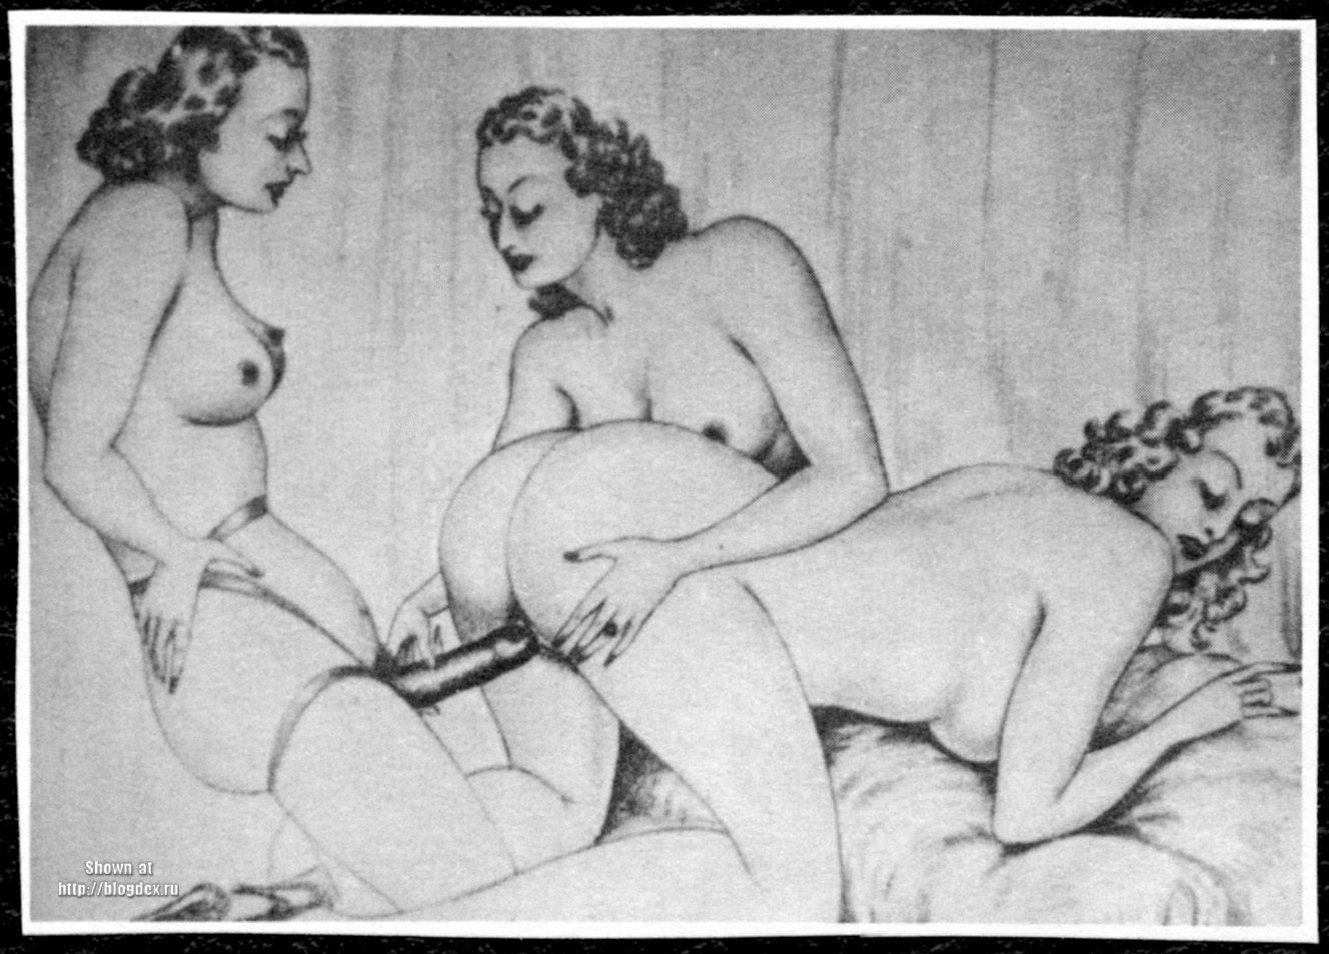 Ретро порно картины, Ретро порно - фото секс 12 фотография